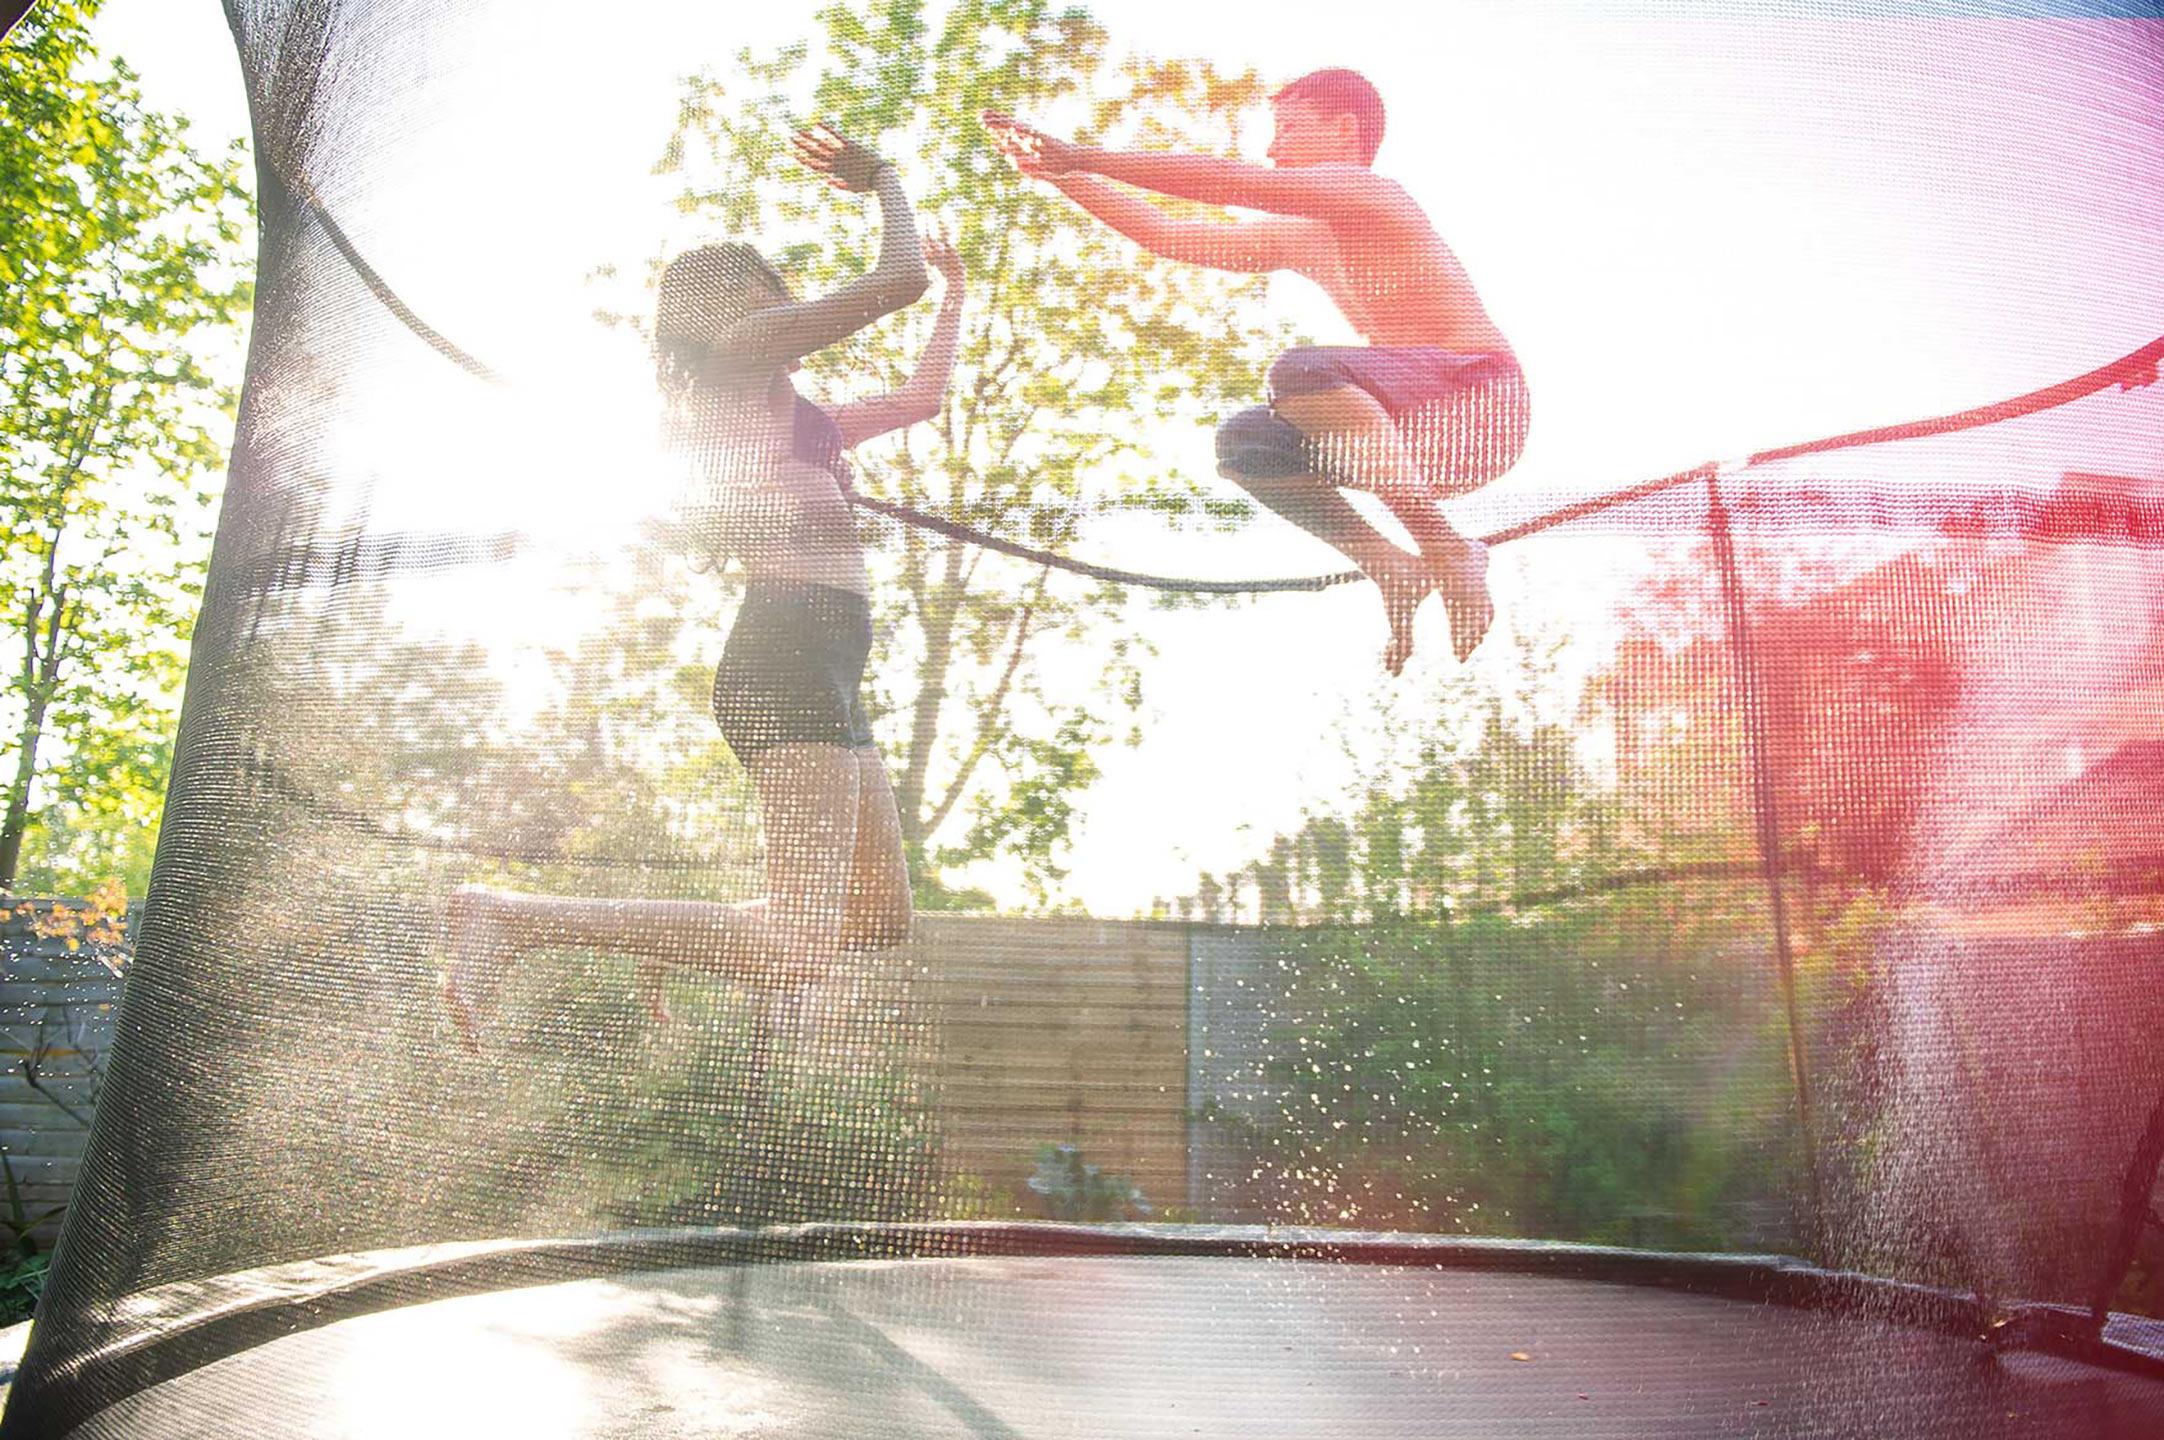 Dean Northcott - girl and boy on trampoline